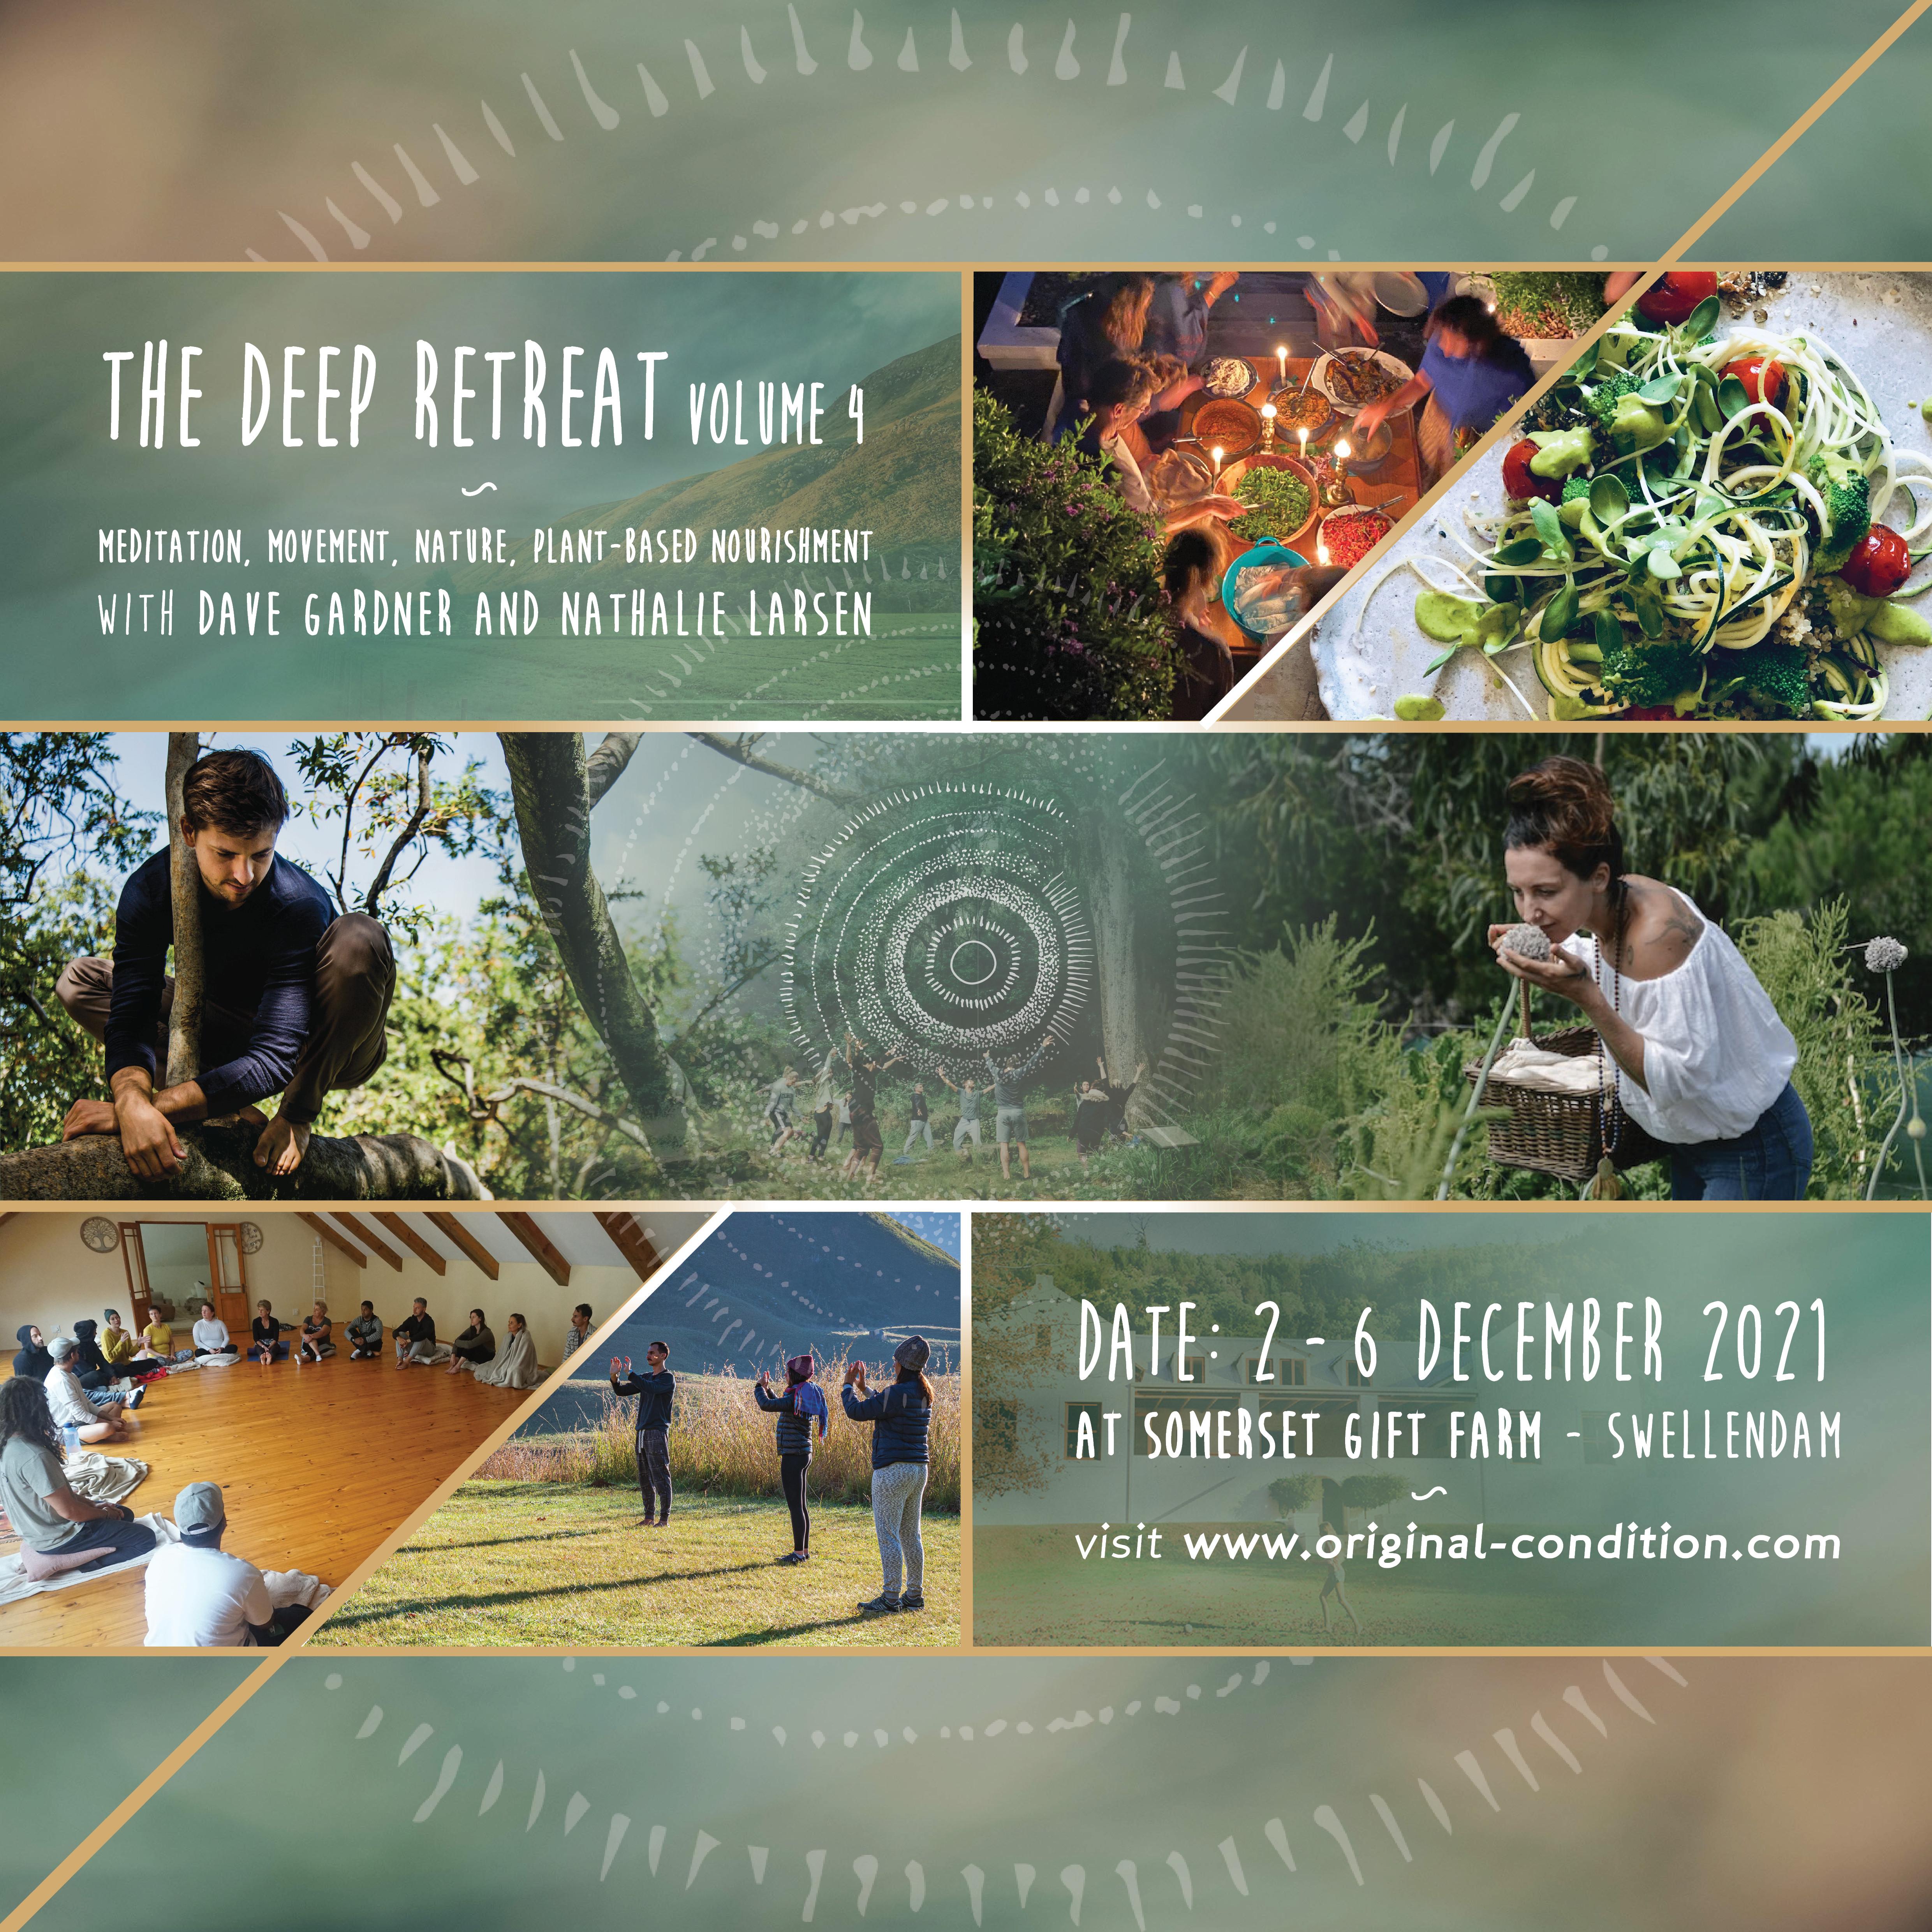 The Deep Retreat (Vol. 4) / *Sharing